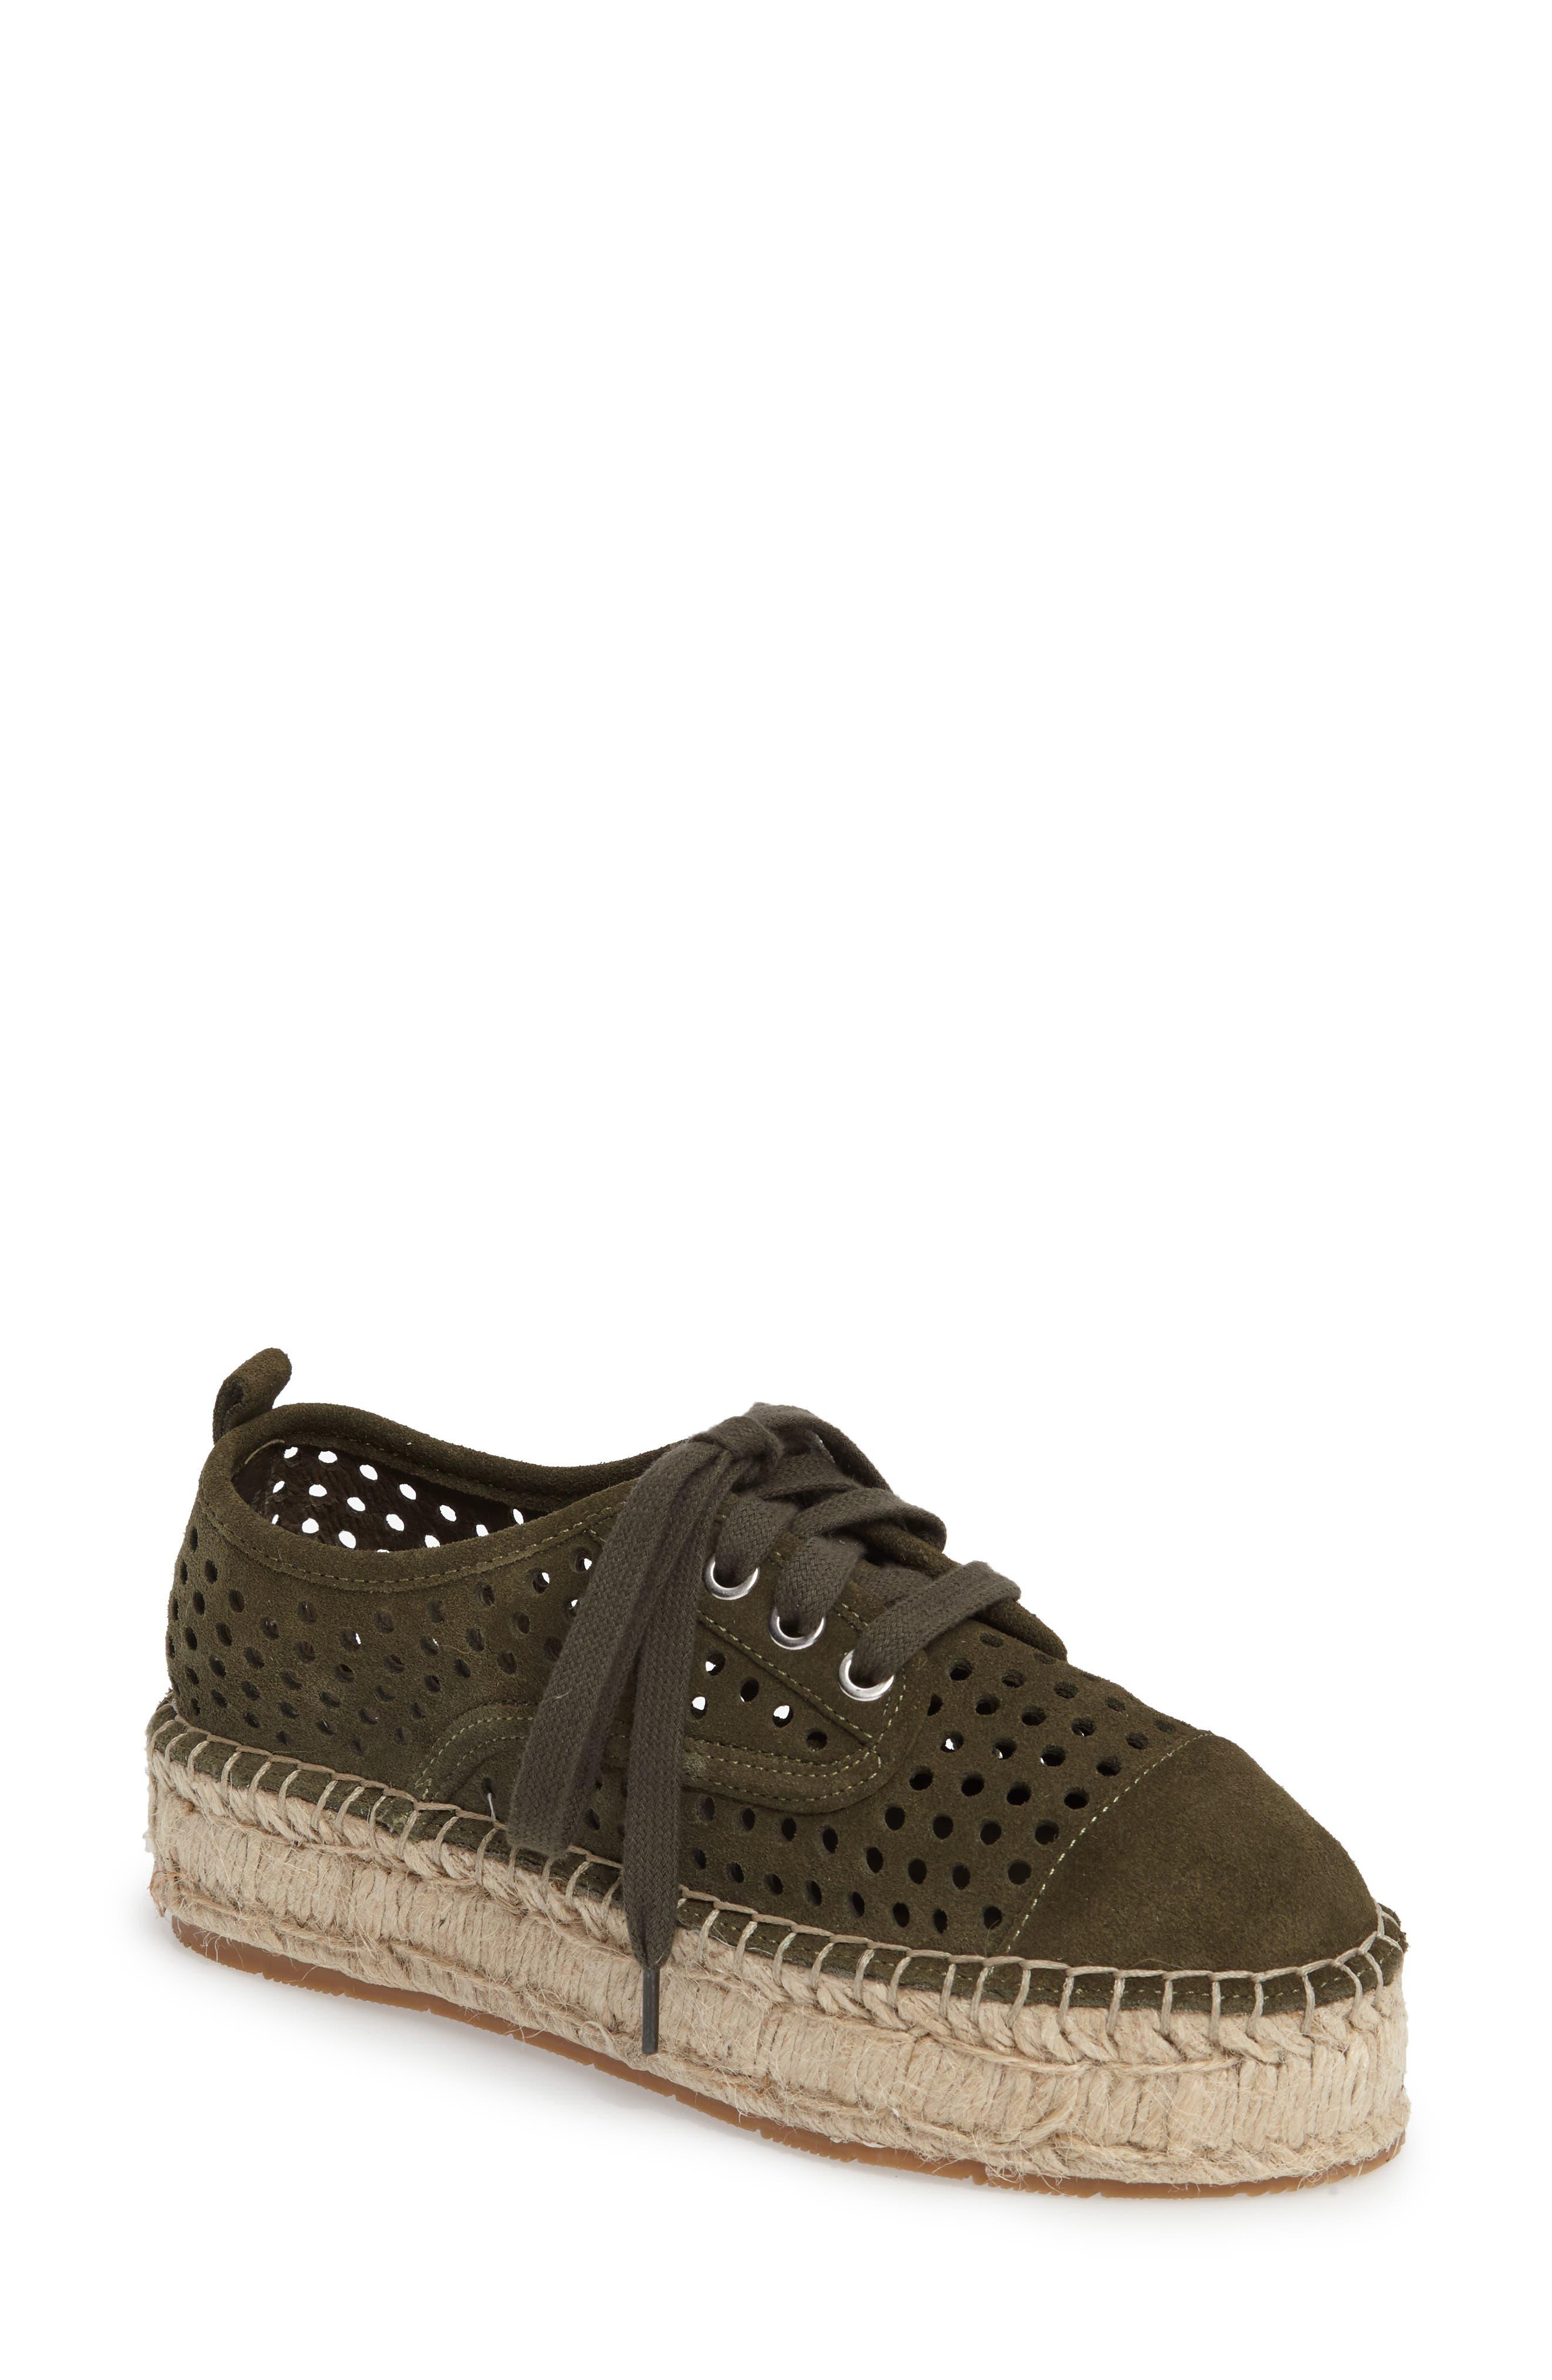 Alternate Image 1 Selected - JSlides Rileyy Espadrille Sneaker (Women)